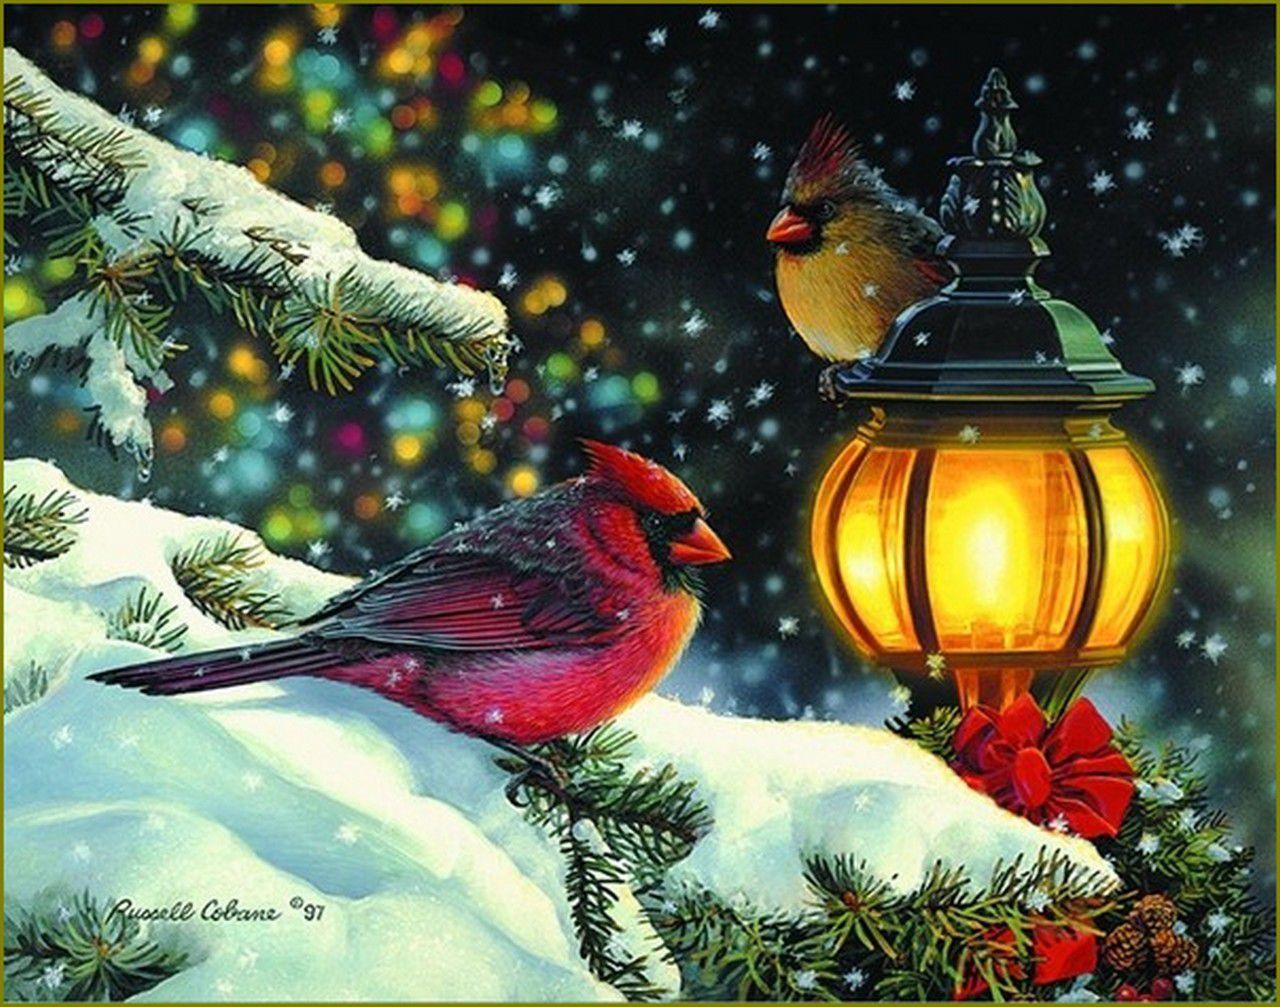 Oiseaux en peinture - Russel Cobane